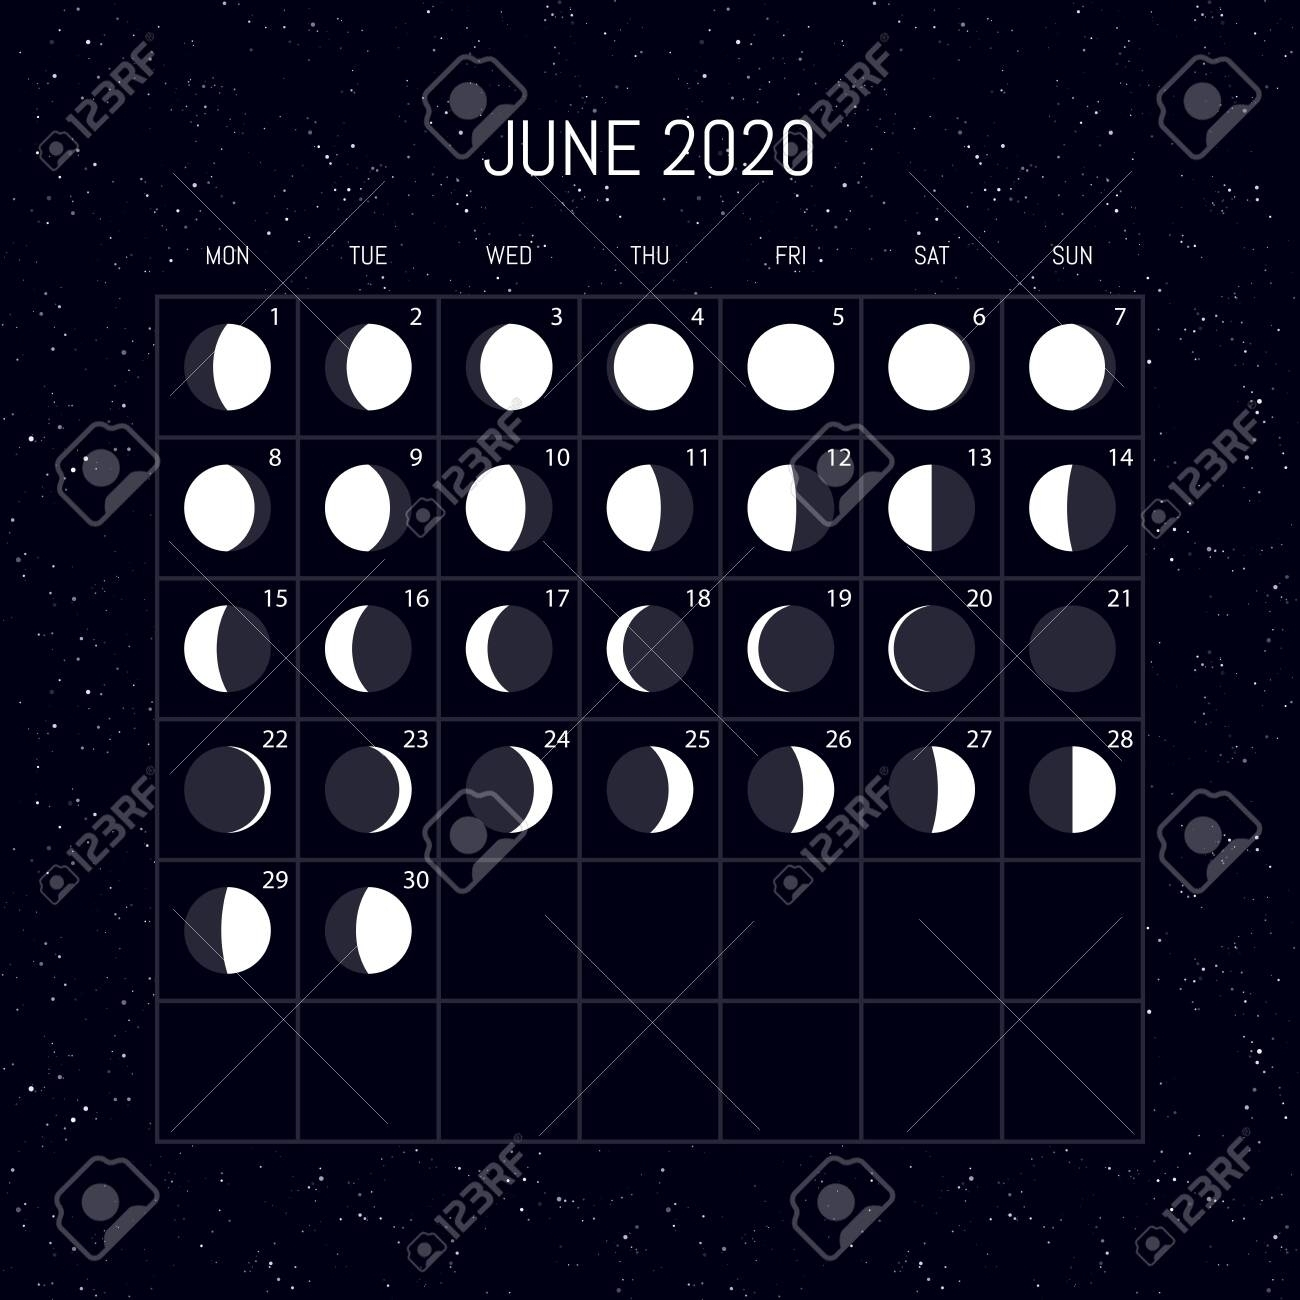 Calendar 2020 With Moon Phases | Calendar Printables Free